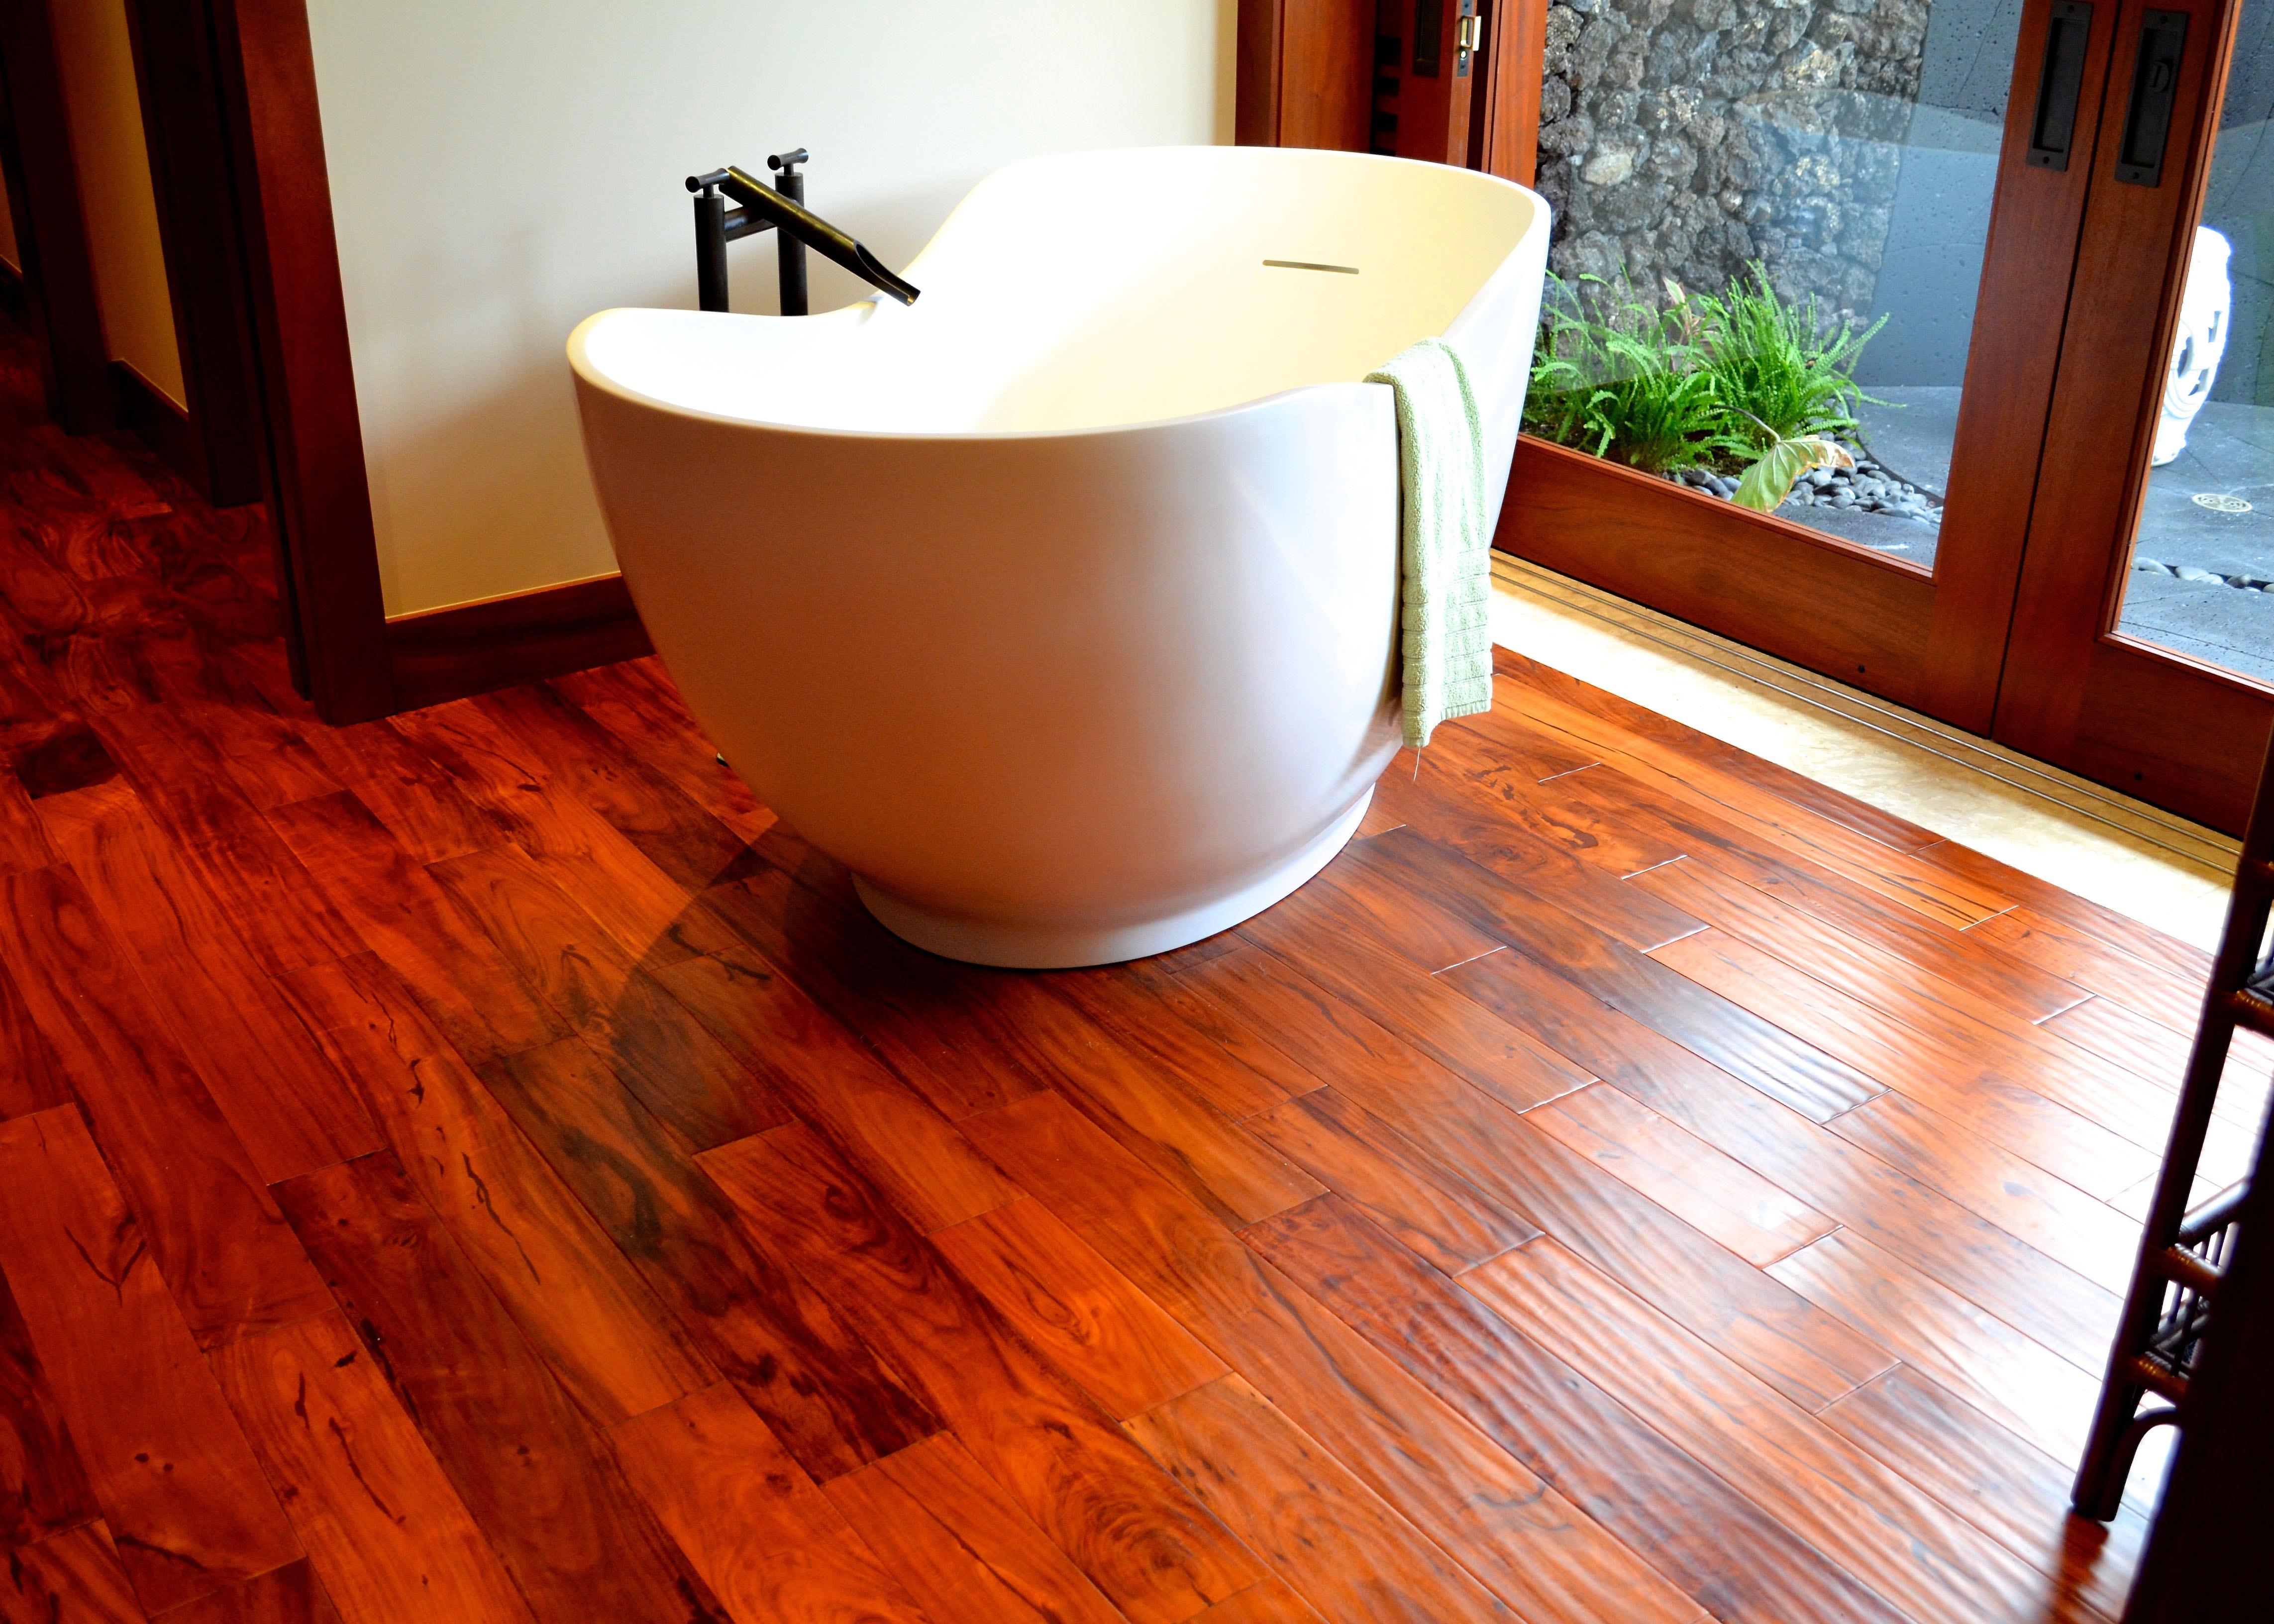 hardwood flooring in bathroom in makena maui